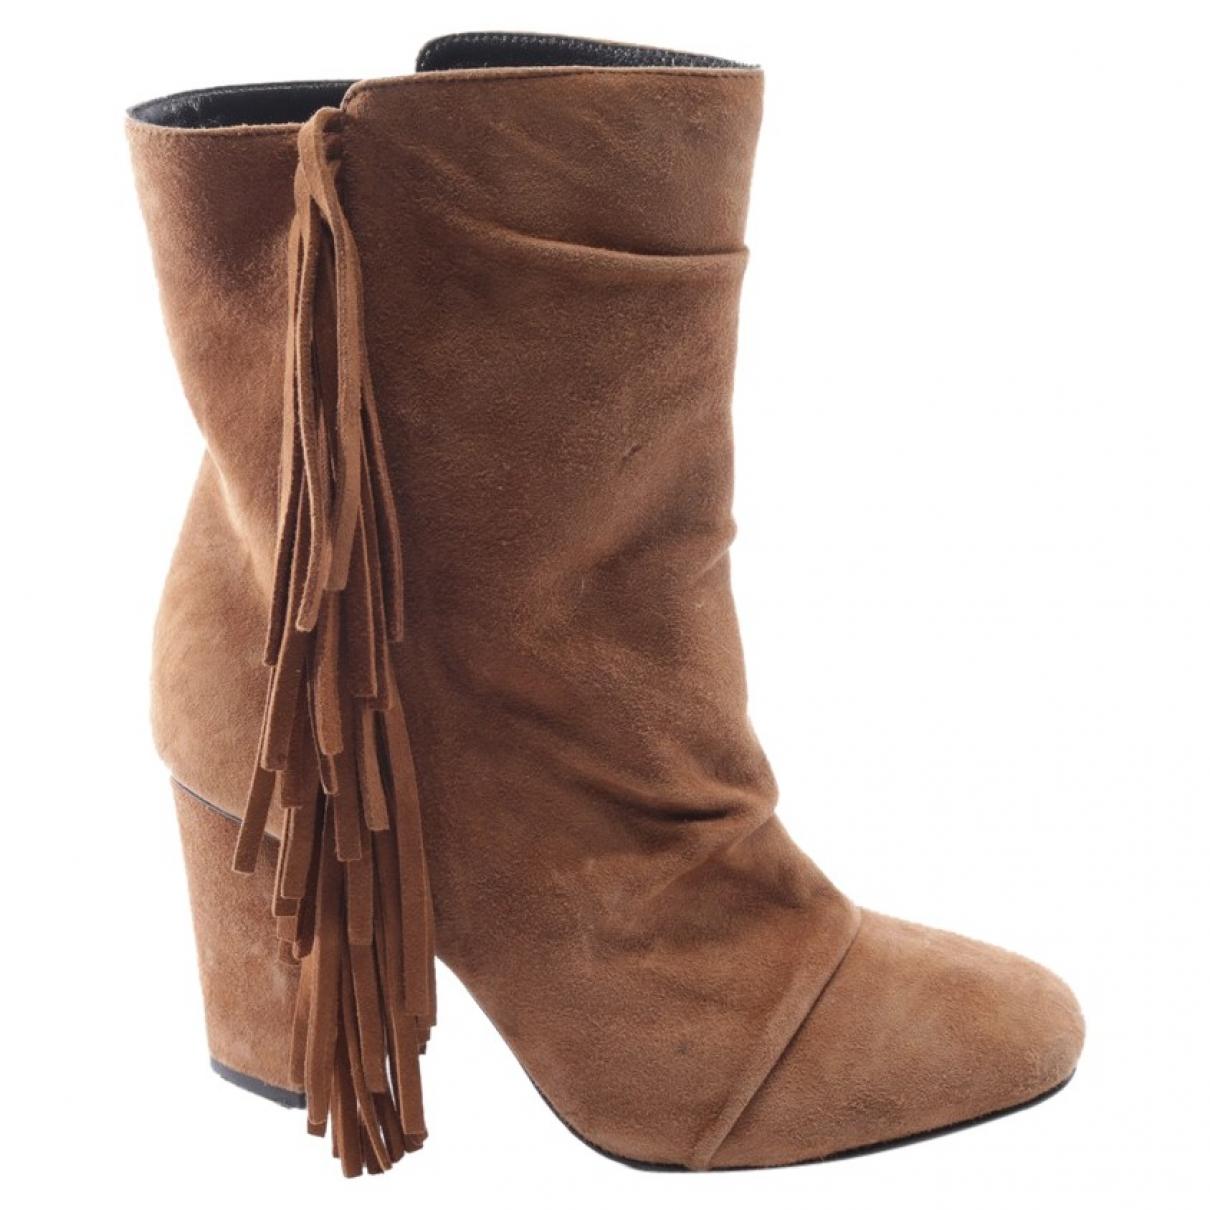 Giuseppe Zanotti - Boots   pour femme en suede - marron